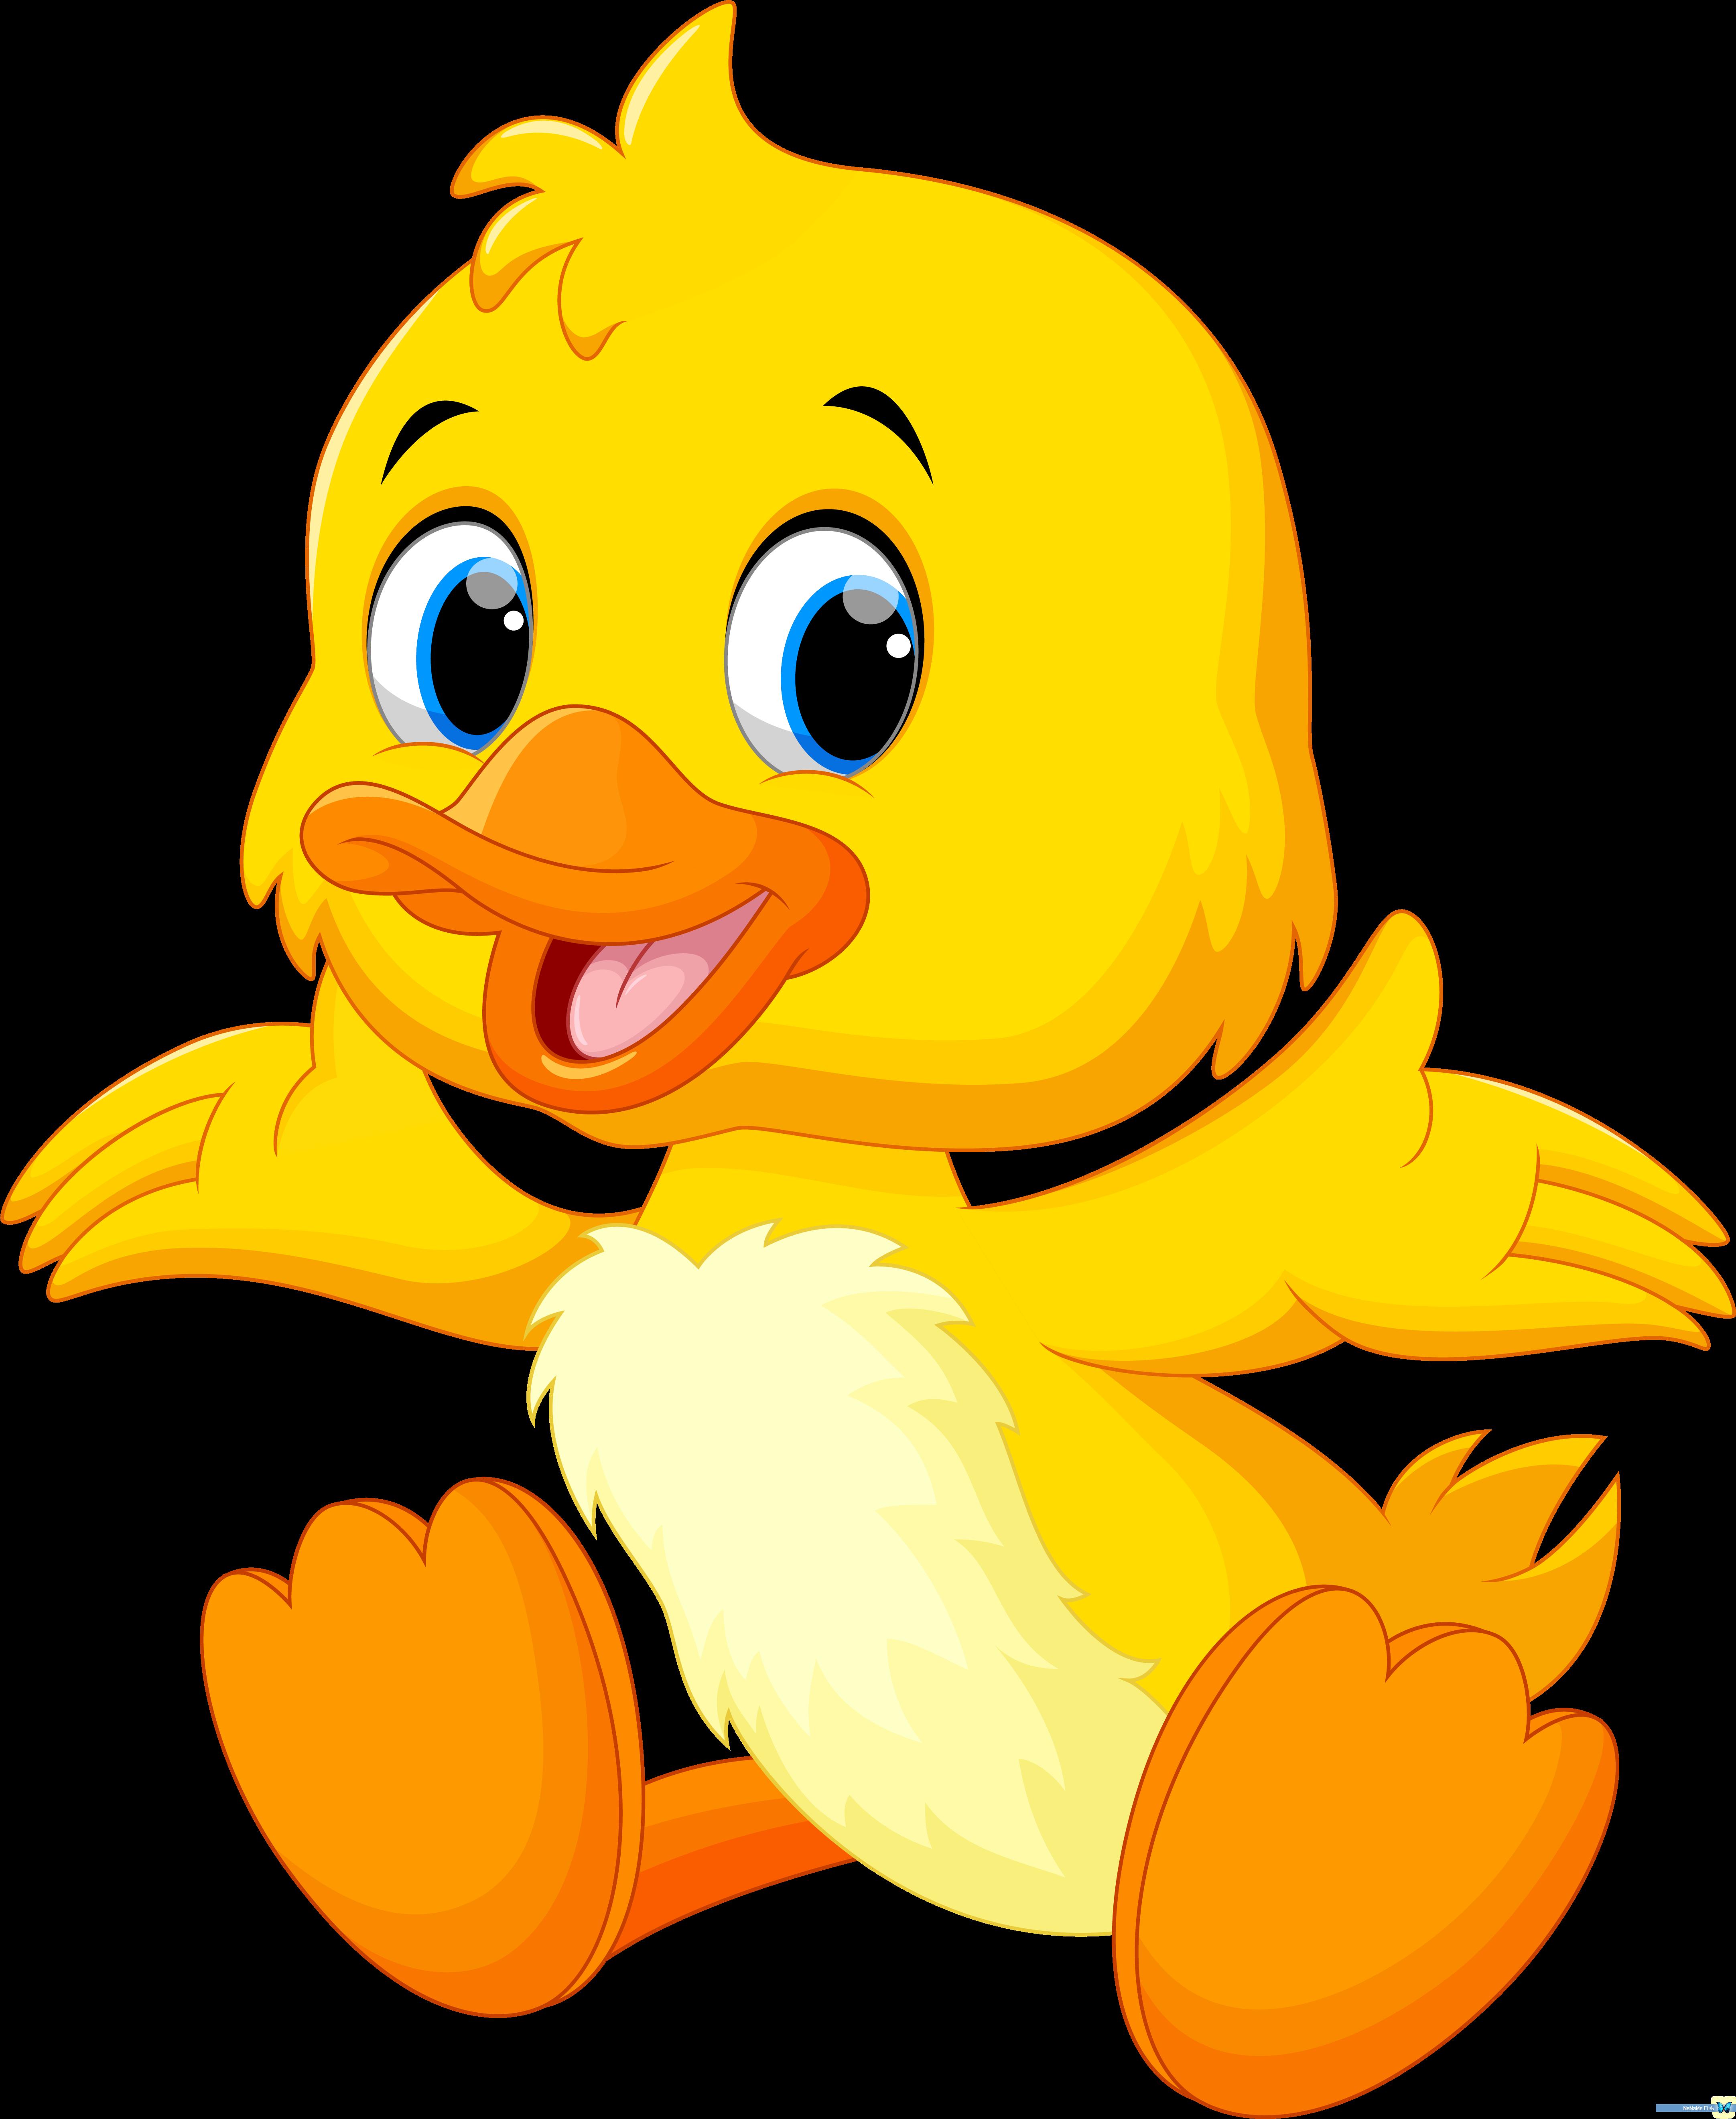 Pin By Borbala Gyorikne Hule On Anka Cute Ducklings Baby Cartoon Duck Cartoon